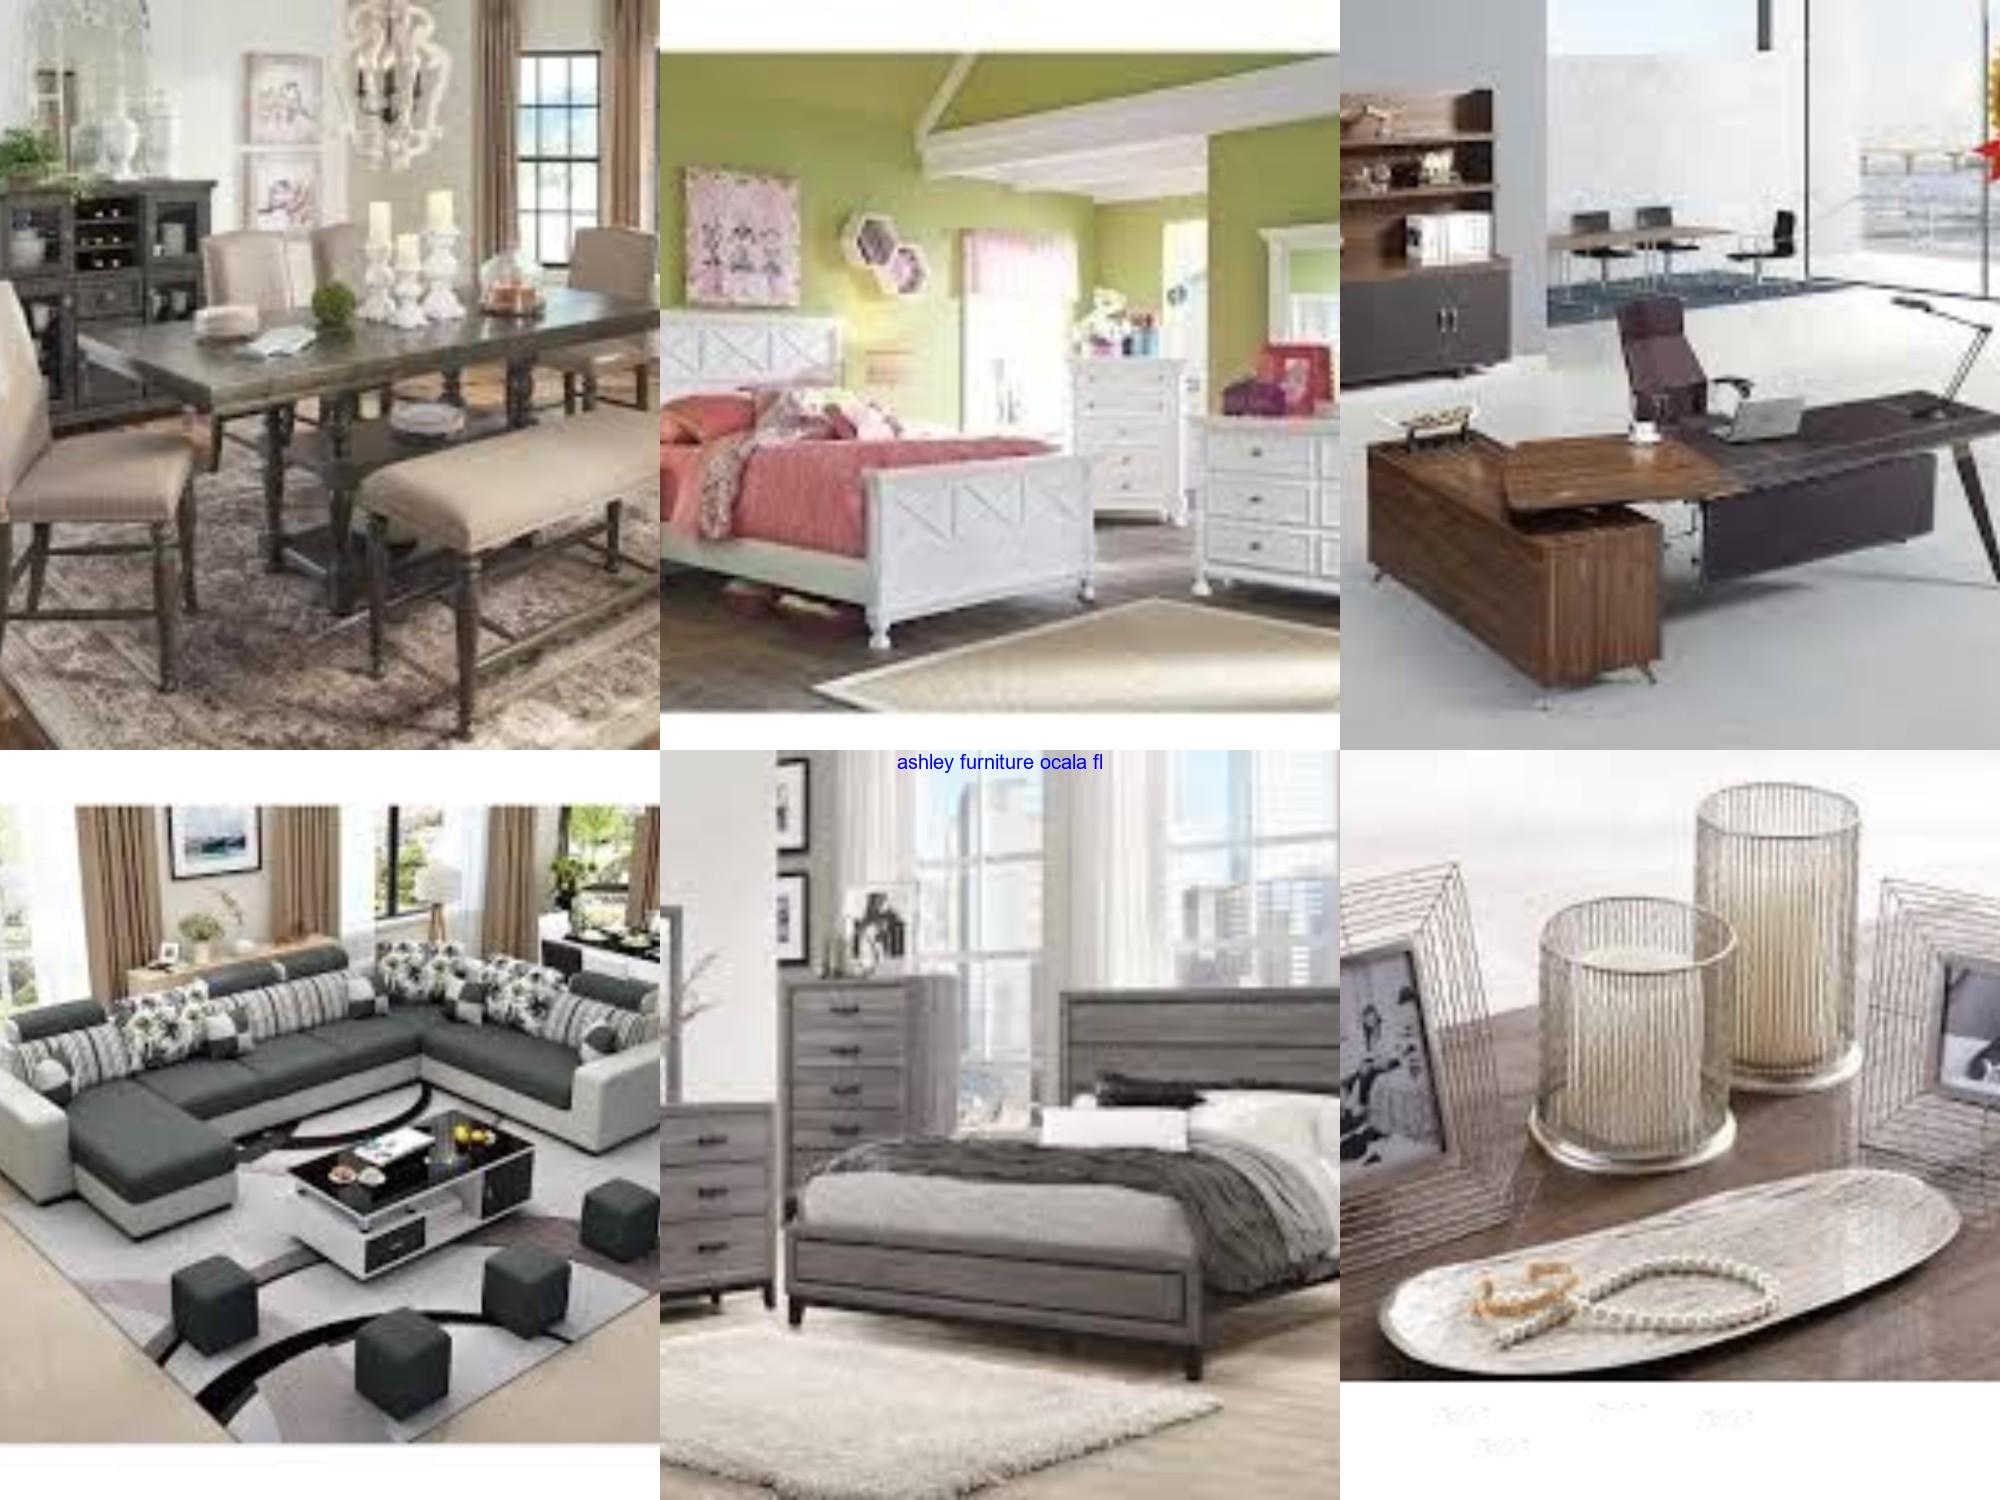 Ashley Furniture Ocala Fl In 2020 Furniture Prices Ashley Furniture Bedroom Set